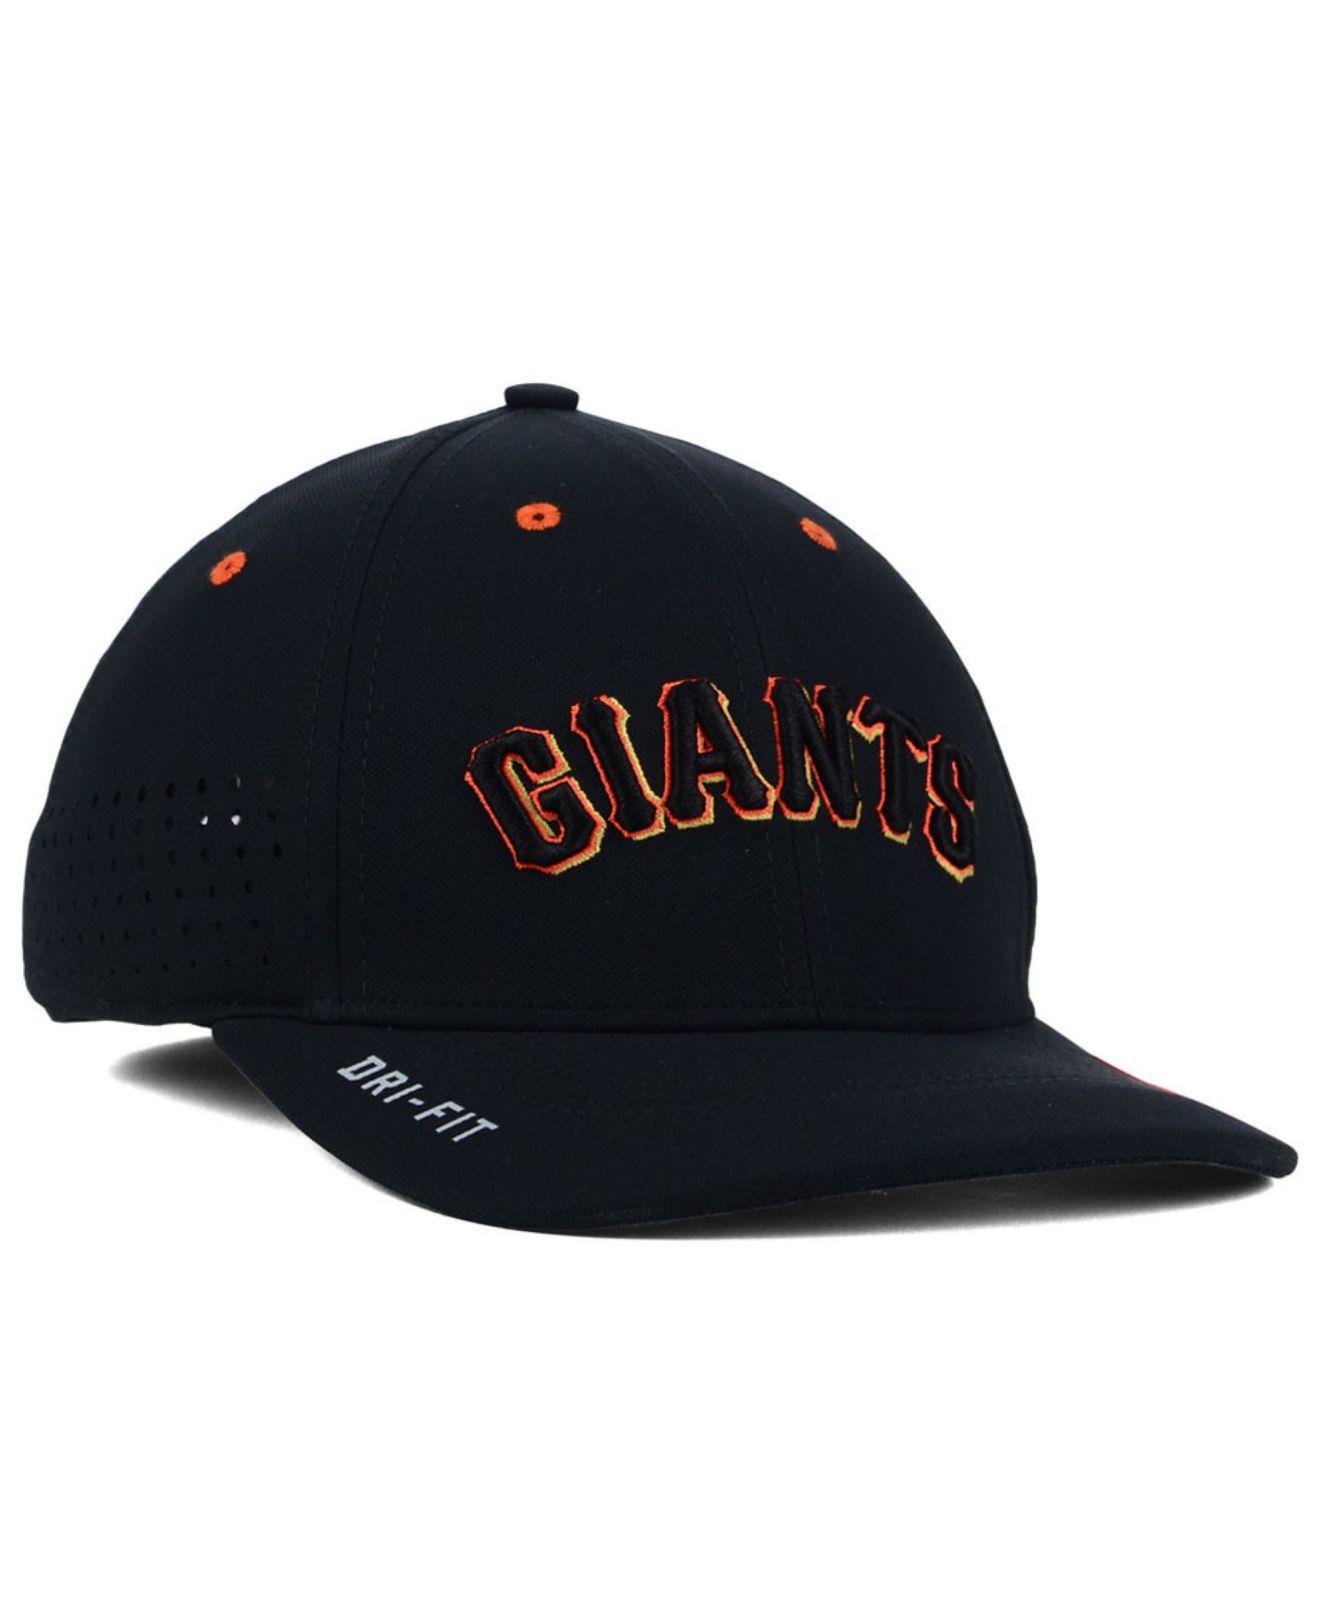 quality design 61c58 170a3 Nike Black San Francisco Giants Vapor Swoosh Flex Cap for men